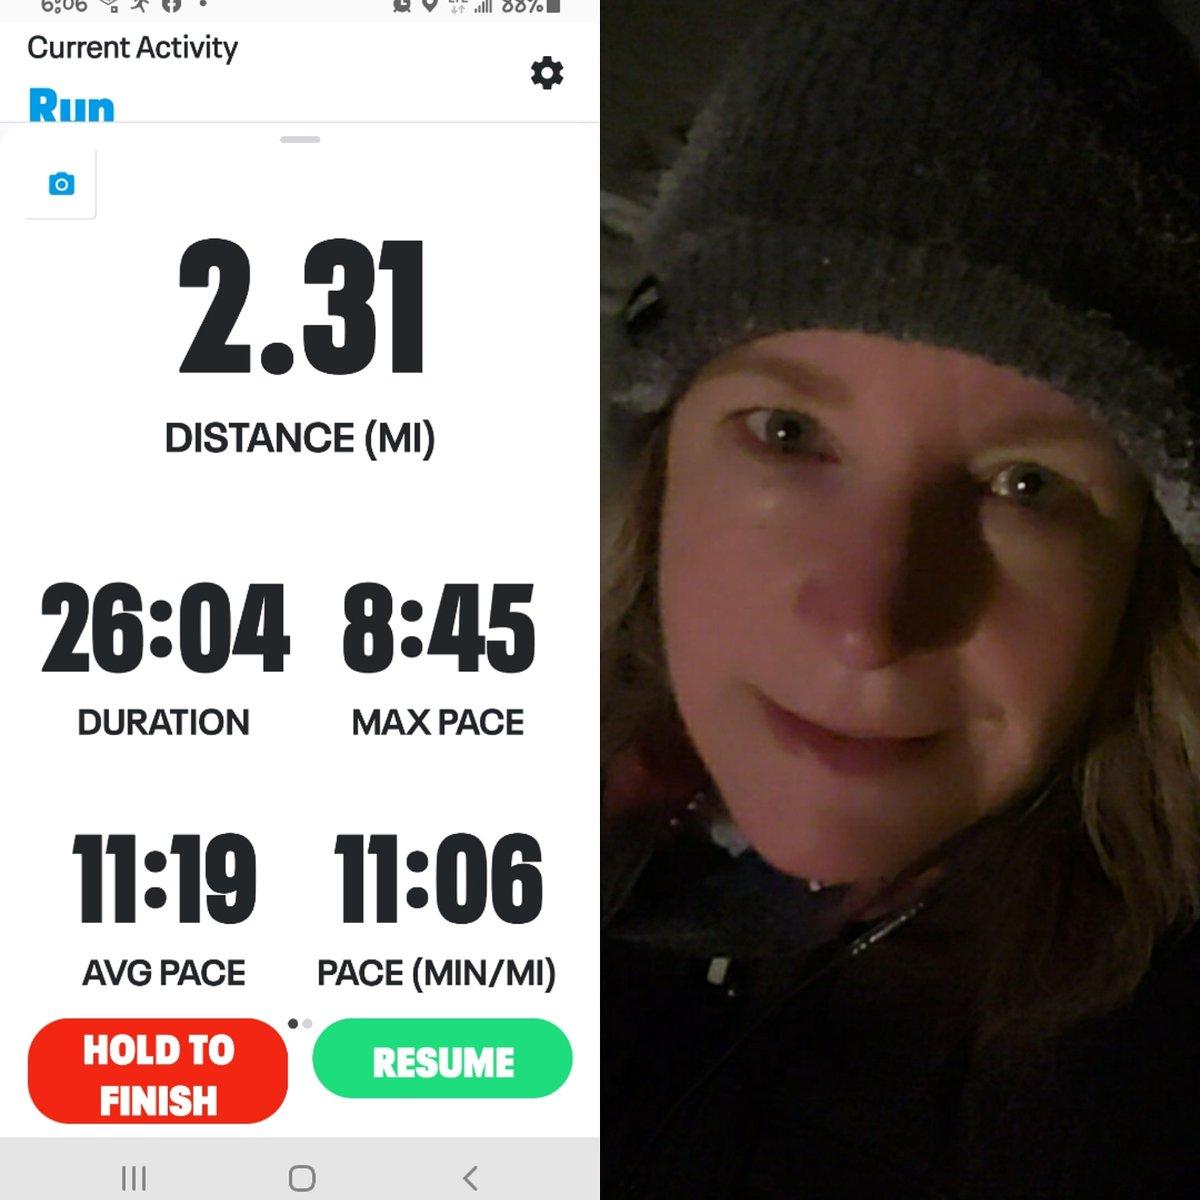 15th run of #winterwarriorchallenge and day 27 of #peakstreak2021. Another frosty run listening to #RedNotice I'm hooked. 🏃🏼♀️⛄ 🌃 #humpdayrun #running #mpc2021 #runpeakerrun #TeamMPCFITLANDERS @MyPeakChallenge @SamHeughan @MPCFitlanders @Sheugs @barbaramills1 @sarahjaswim @pjl24